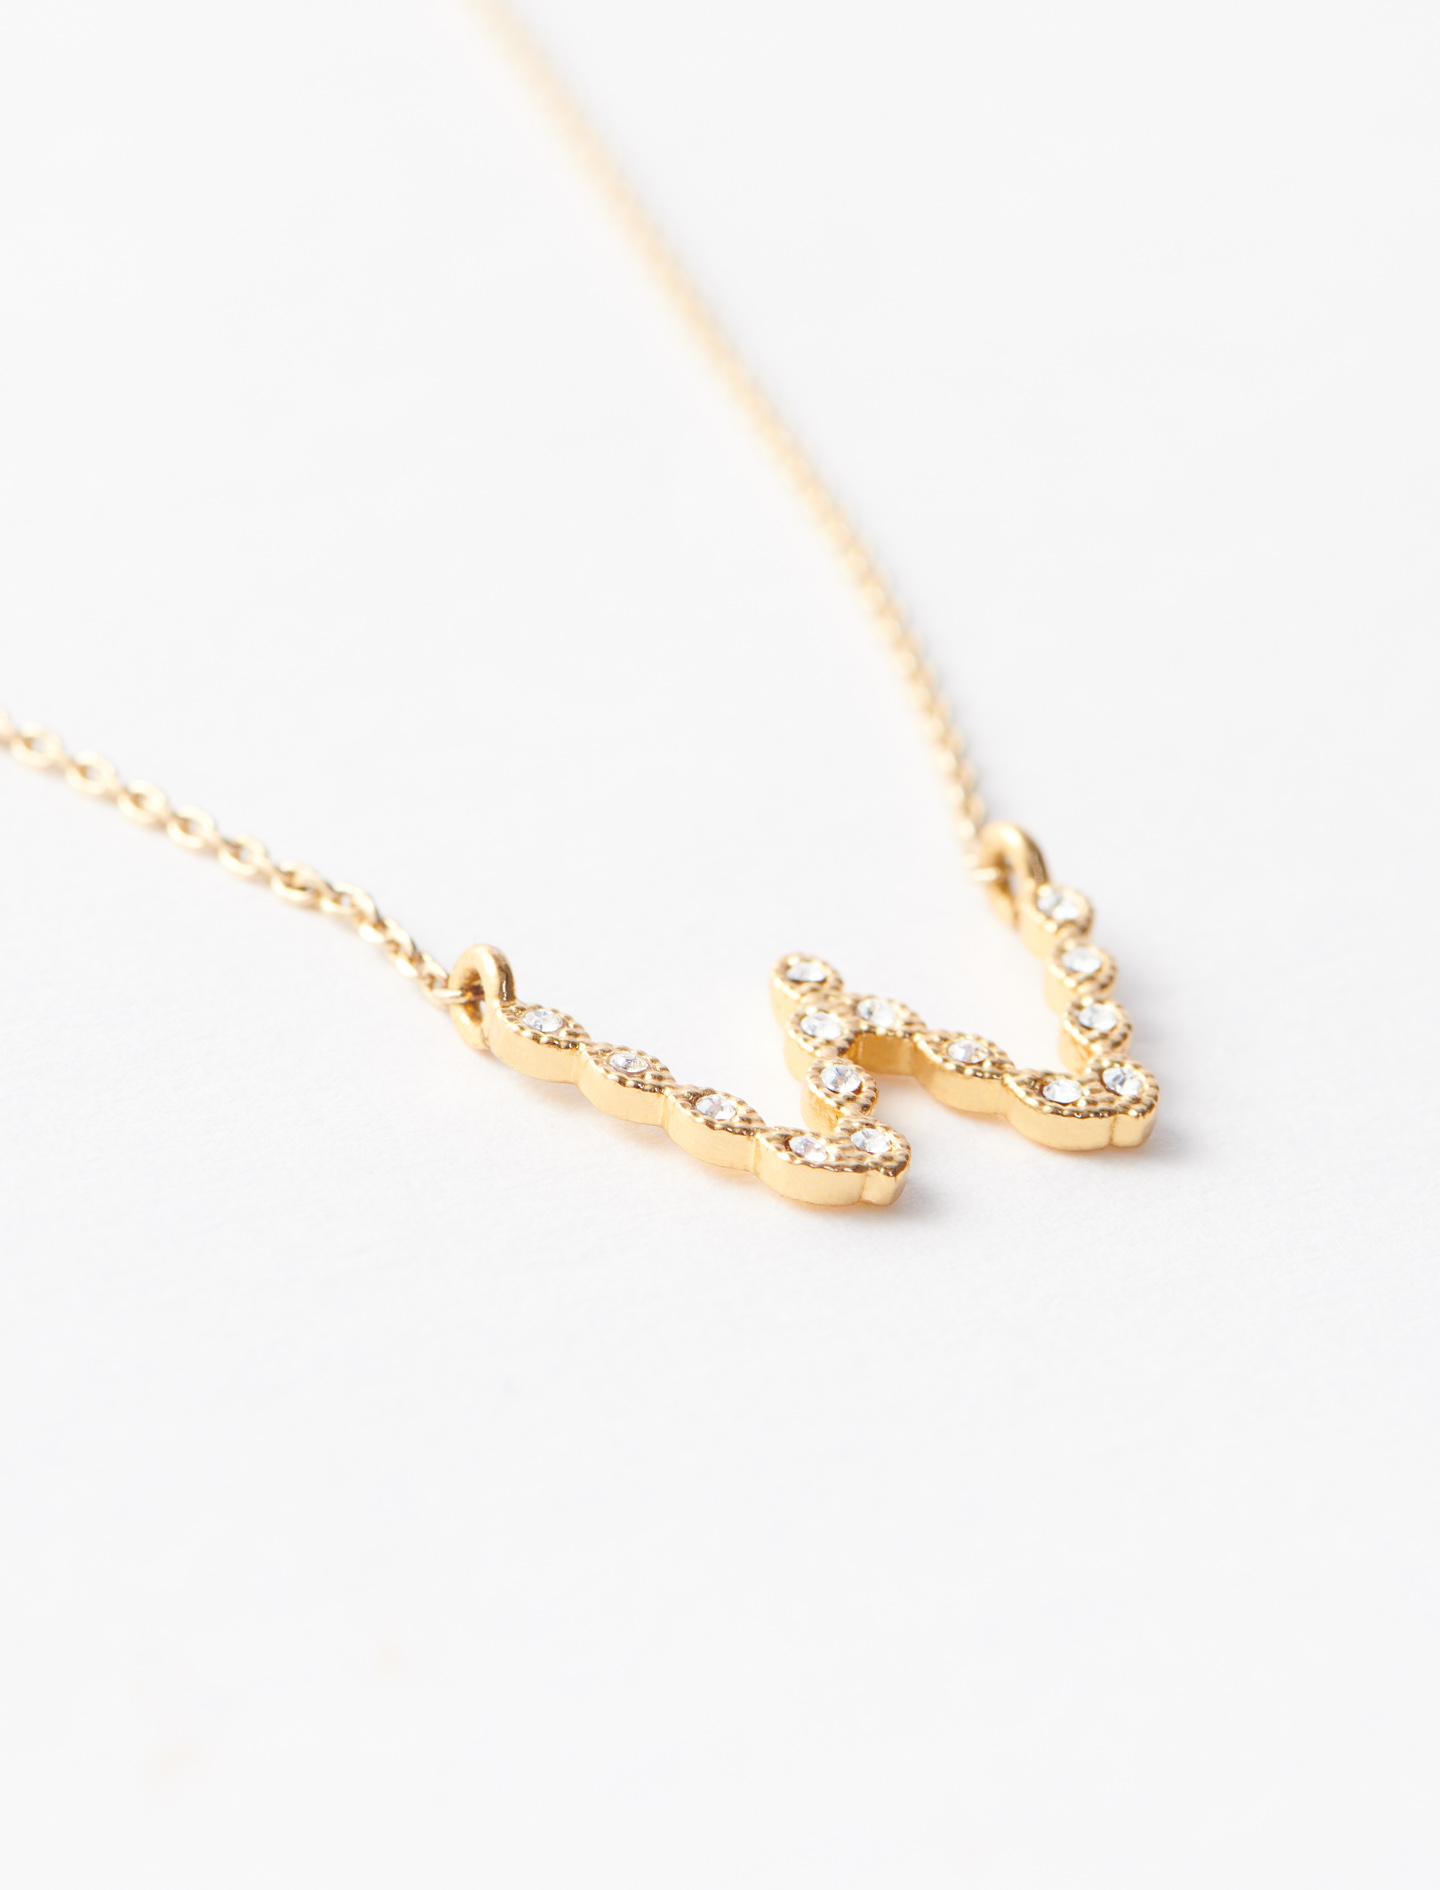 Rhinestone W necklace - Gold